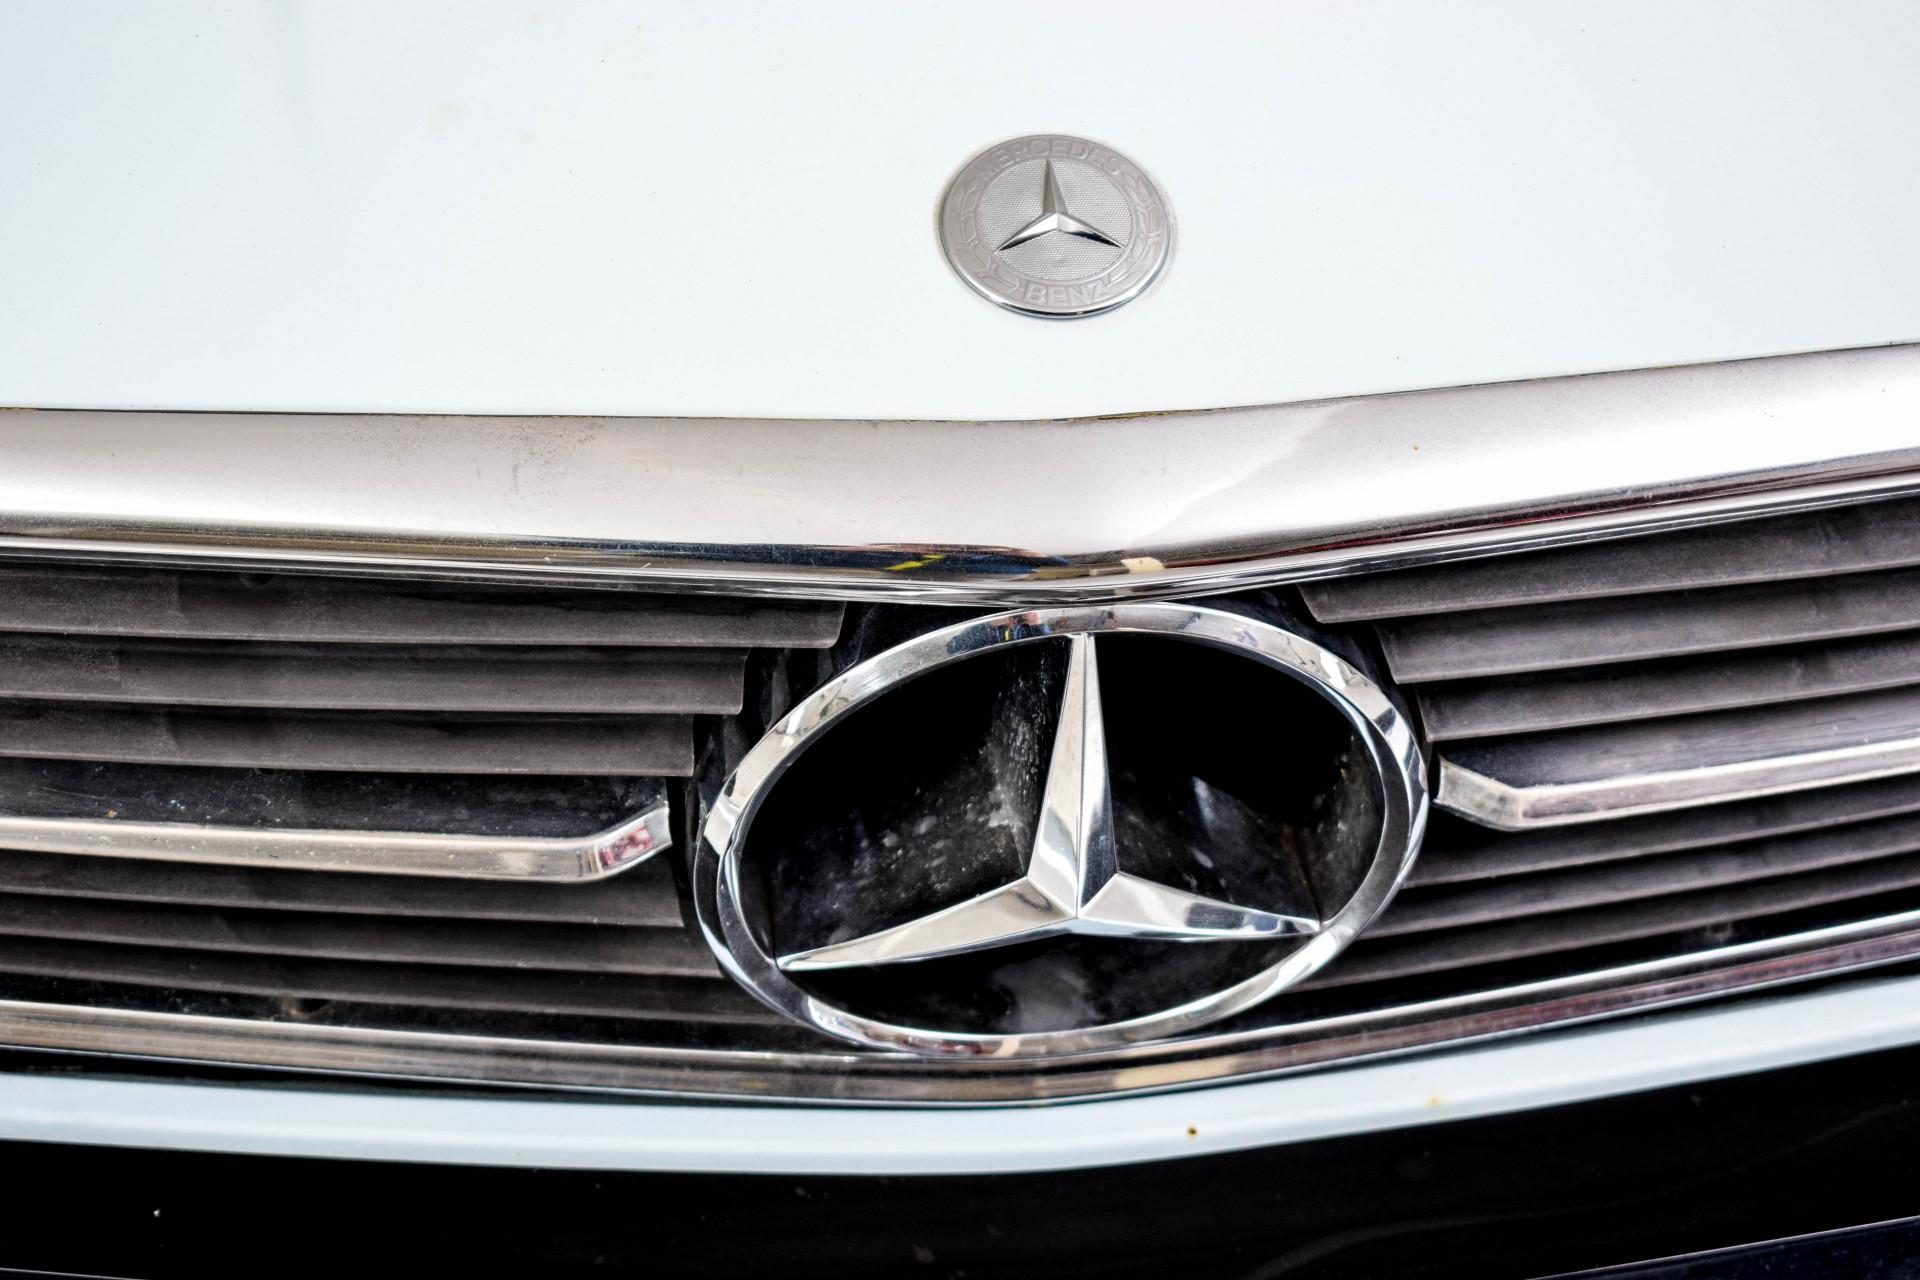 Mercedes-Benz SL-Klasse 450 SL Roadster Foto 13